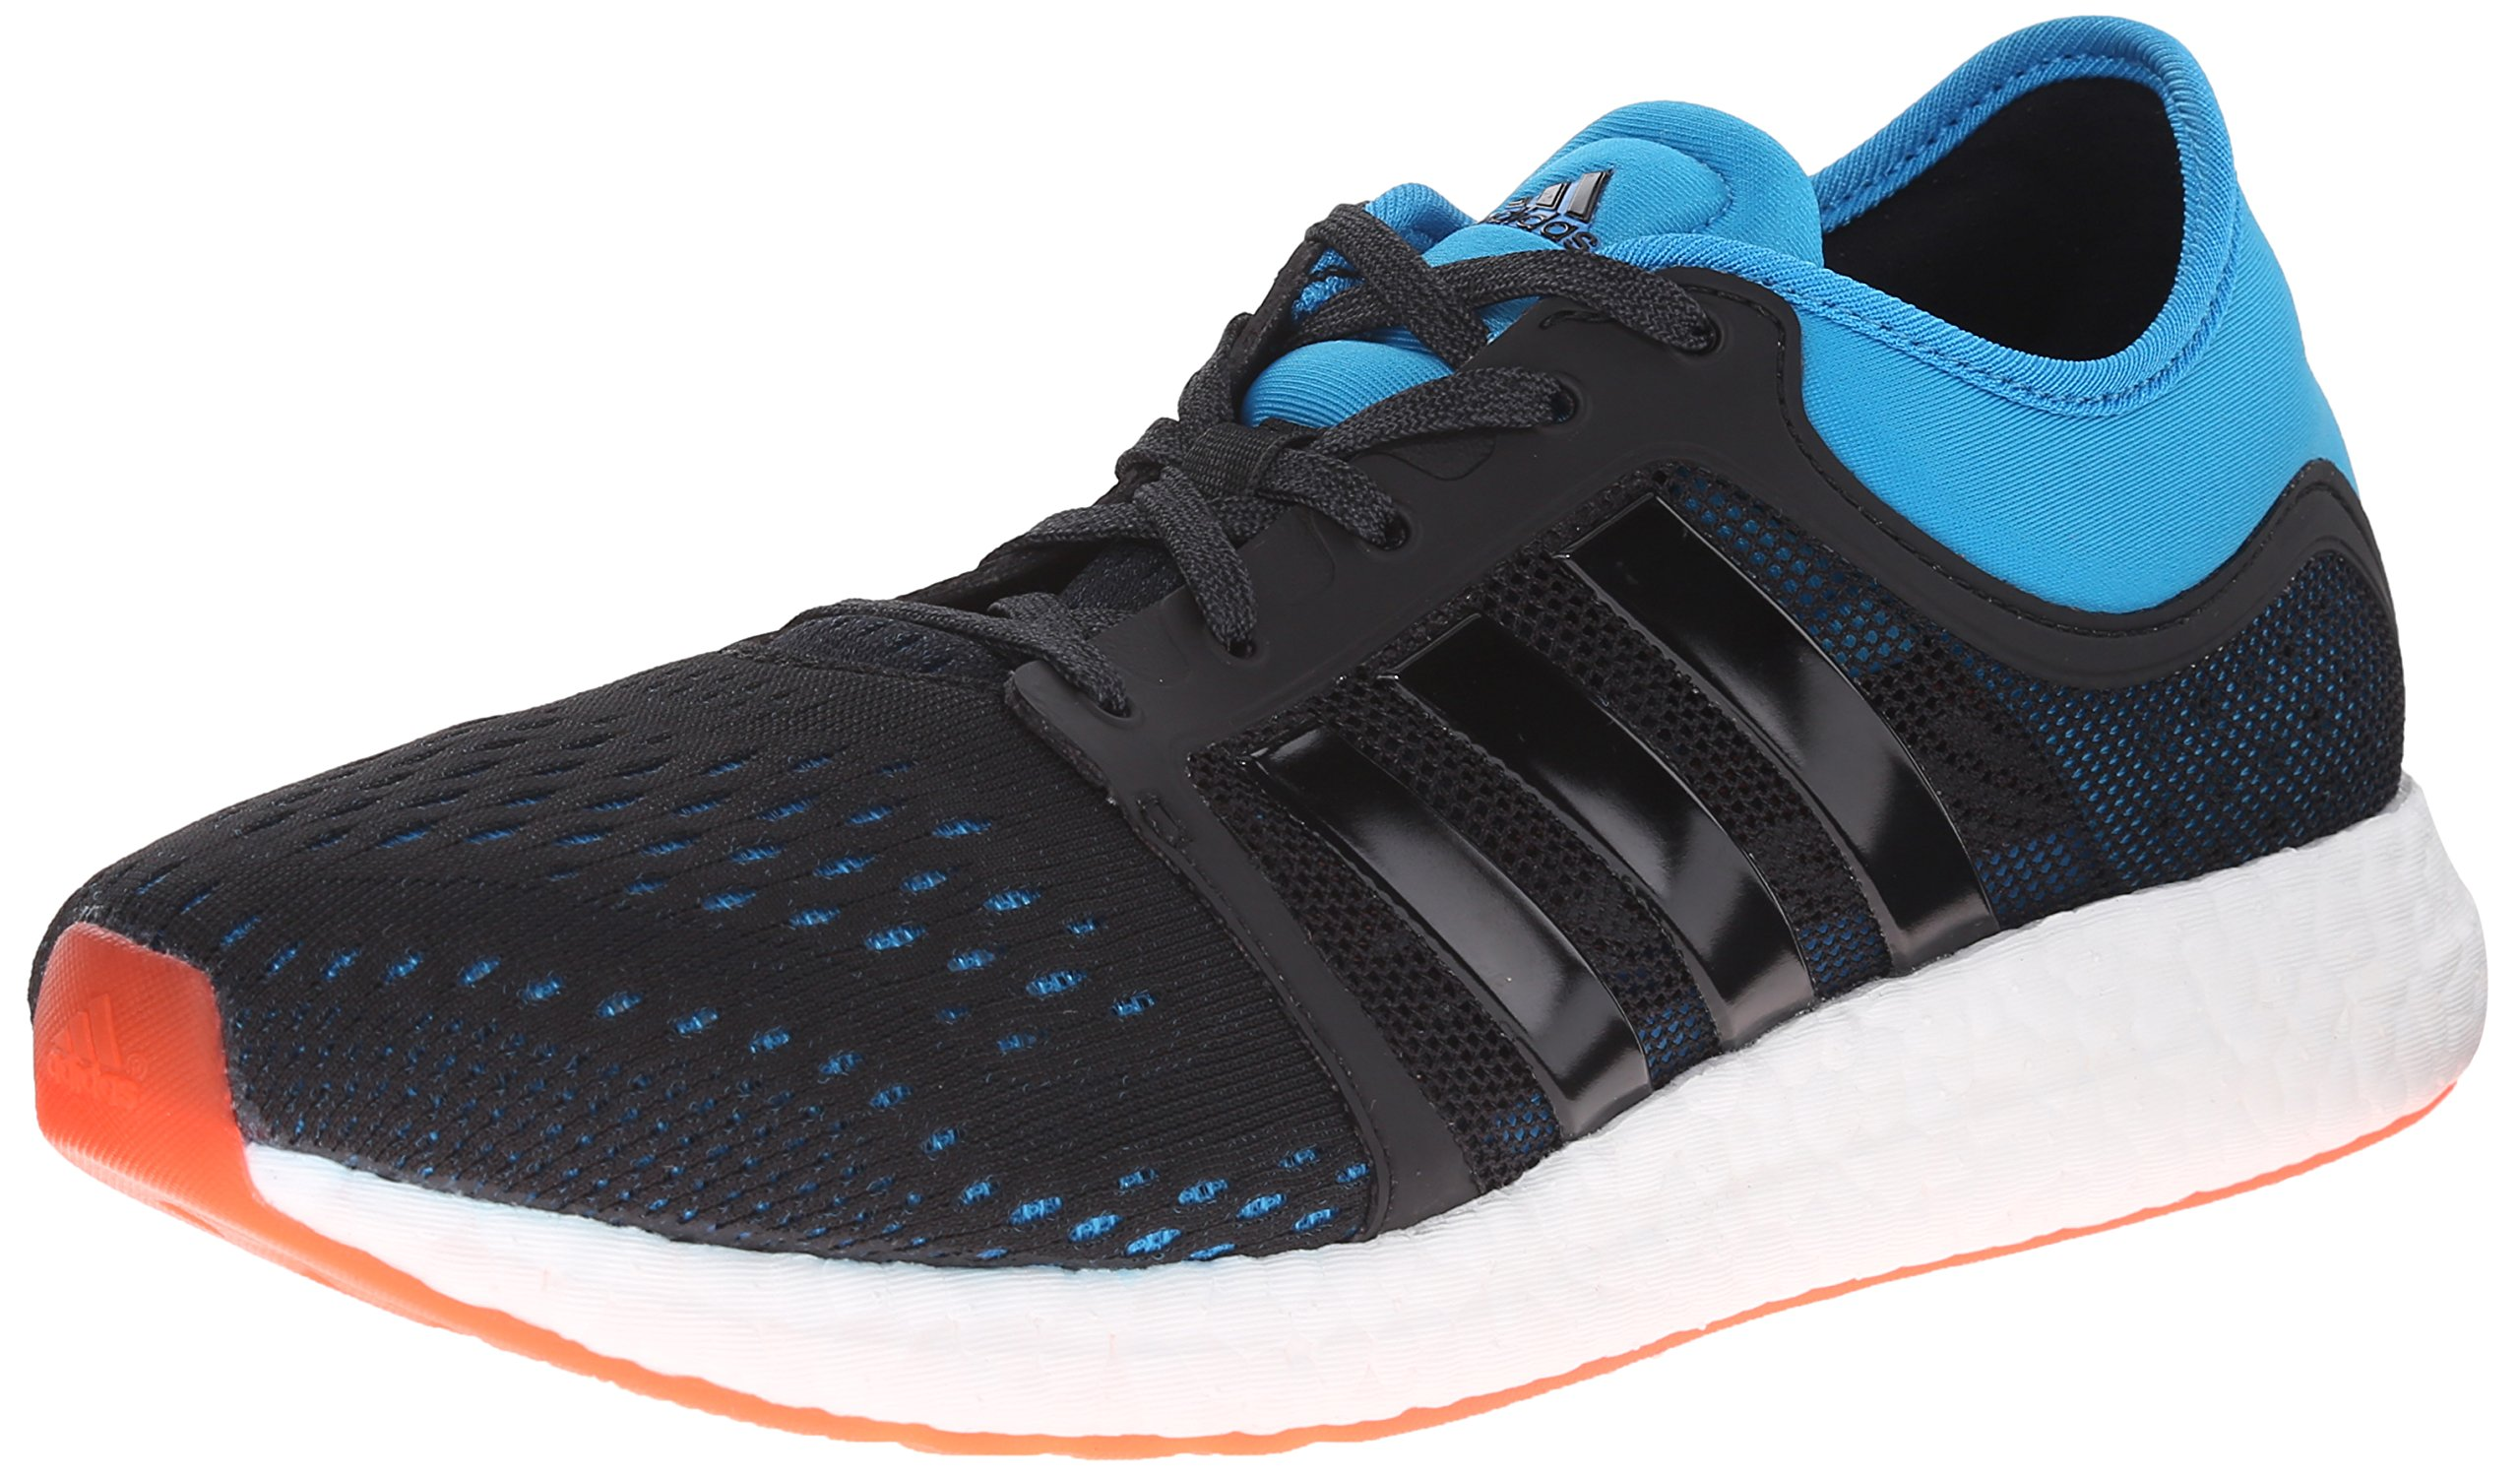 dd58729d23d Galleon - Adidas Performance Men s CC Rocket Boost M Running Shoe ...